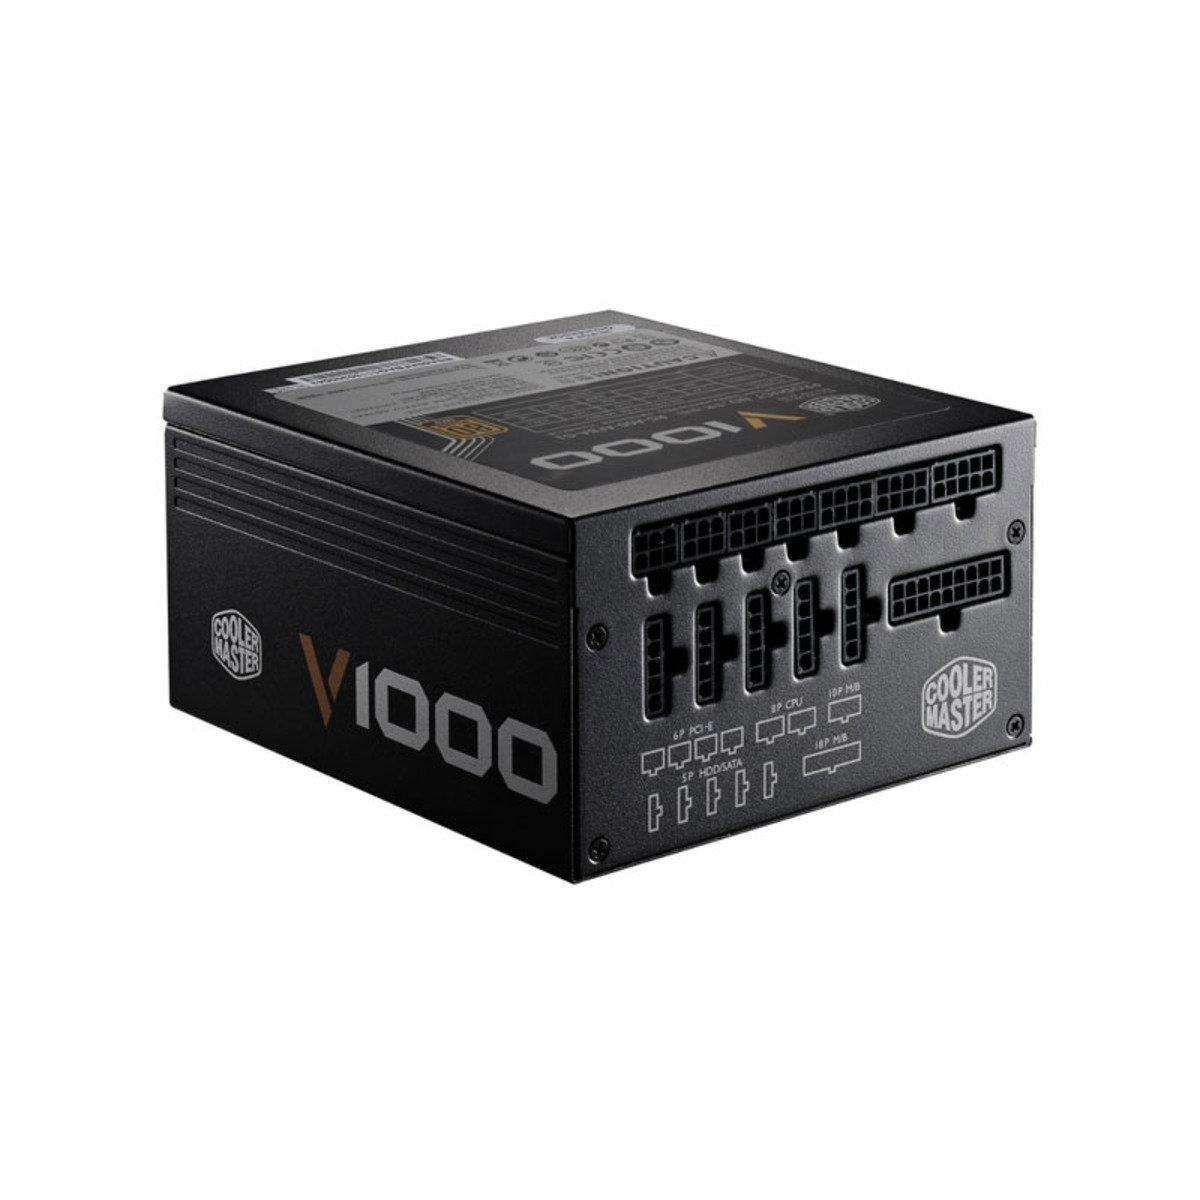 80Plus金認證 極致專家系列 V1000 1000w 電腦變壓器